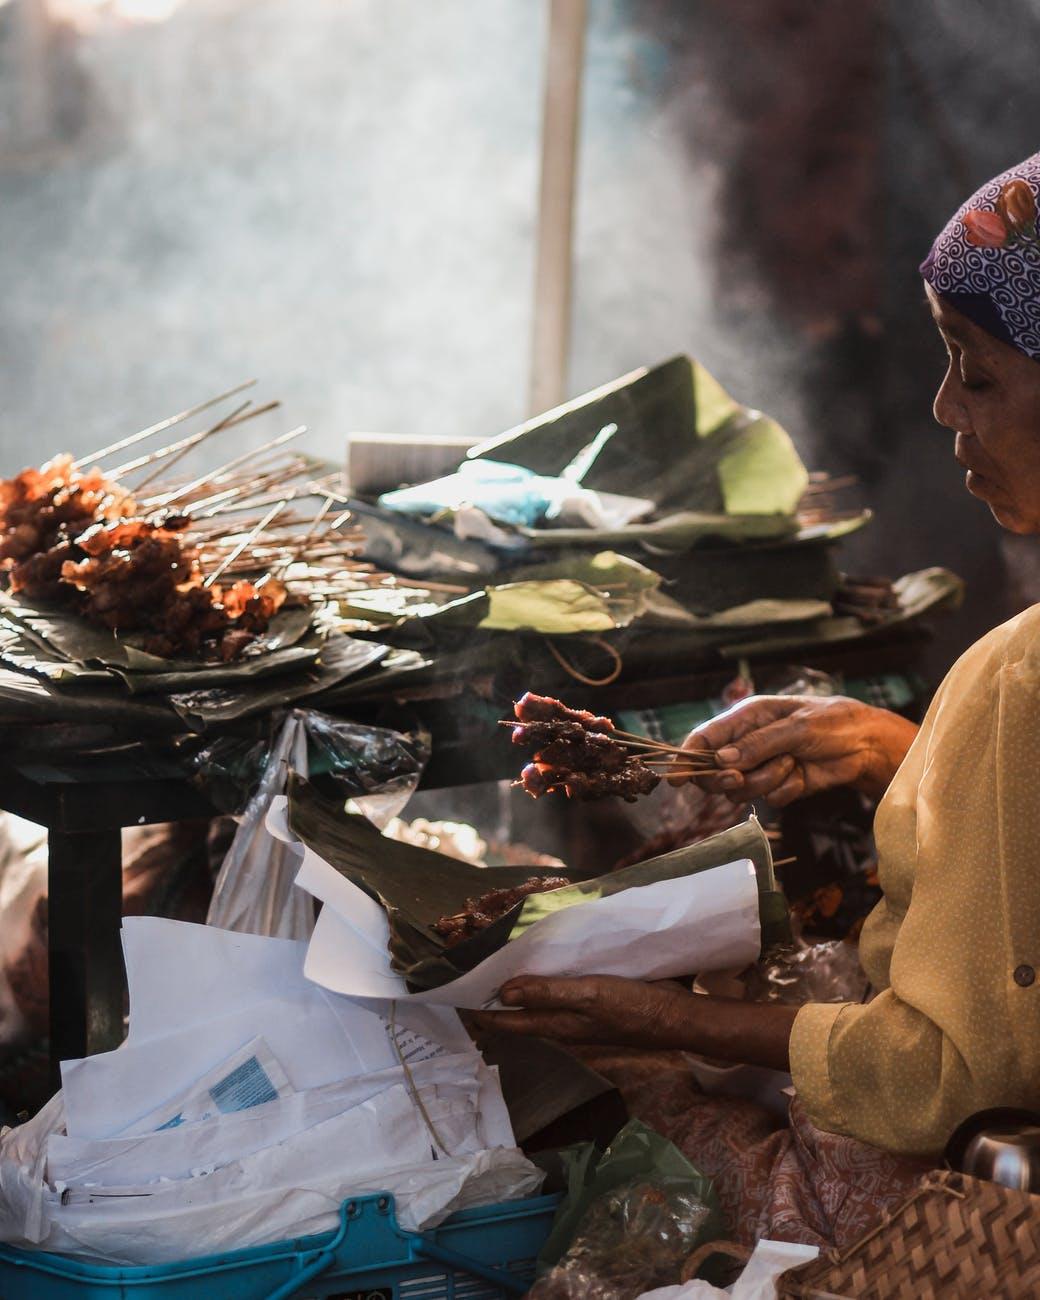 Tempat Kuliner di Yogyakarta Legendaris Murah Meriah